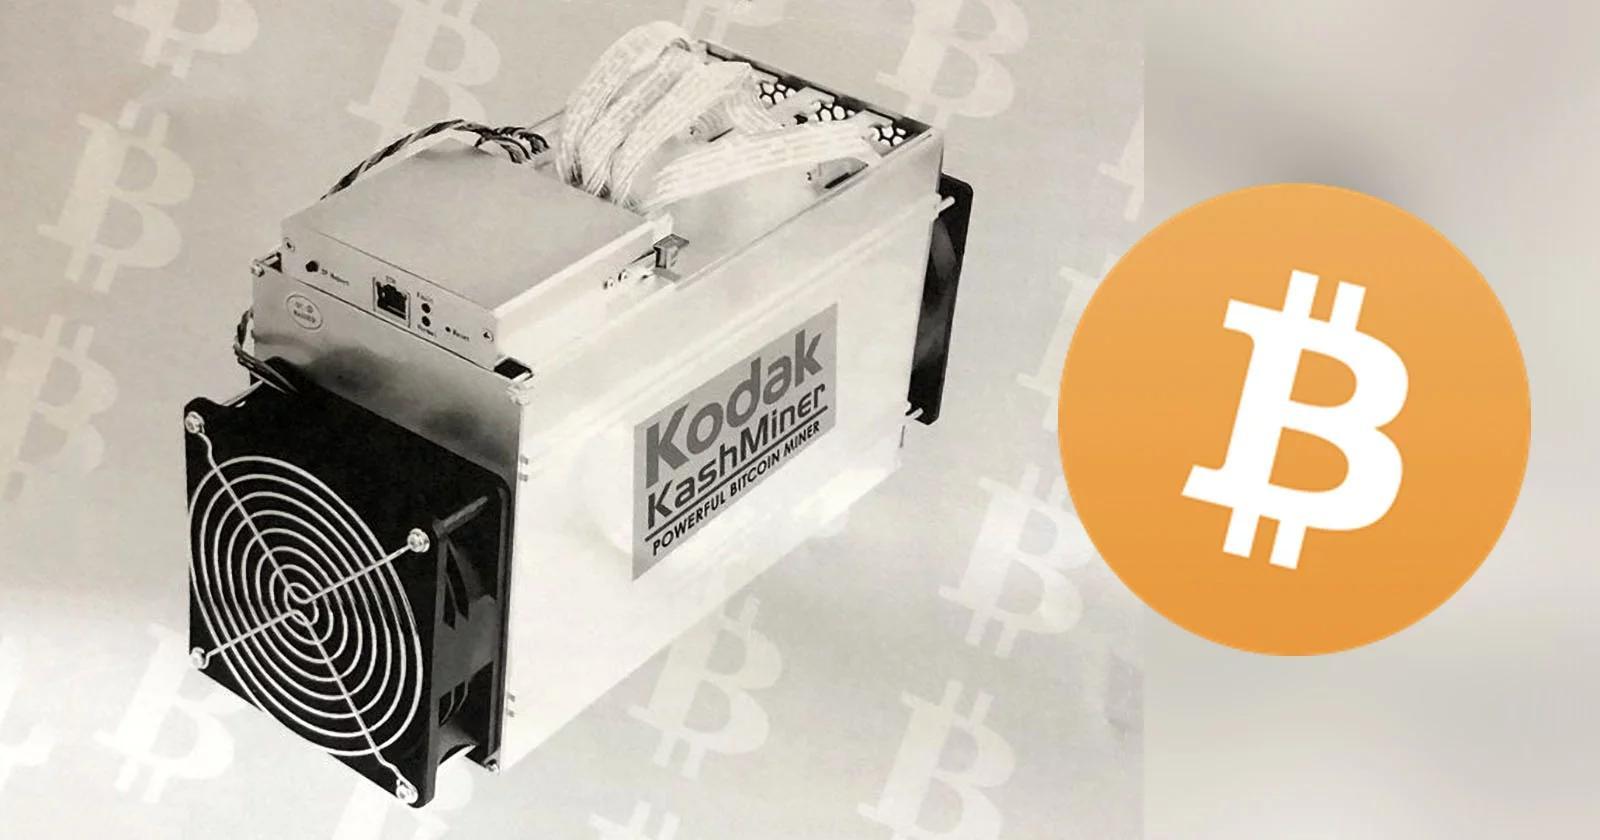 Kodacoin era uno Scam Kodak Bitcoin Mining stato ucciso dalla SEC - Kodacoin era uno Scam: Kodak Bitcoin Mining è stato ucciso dalla SEC